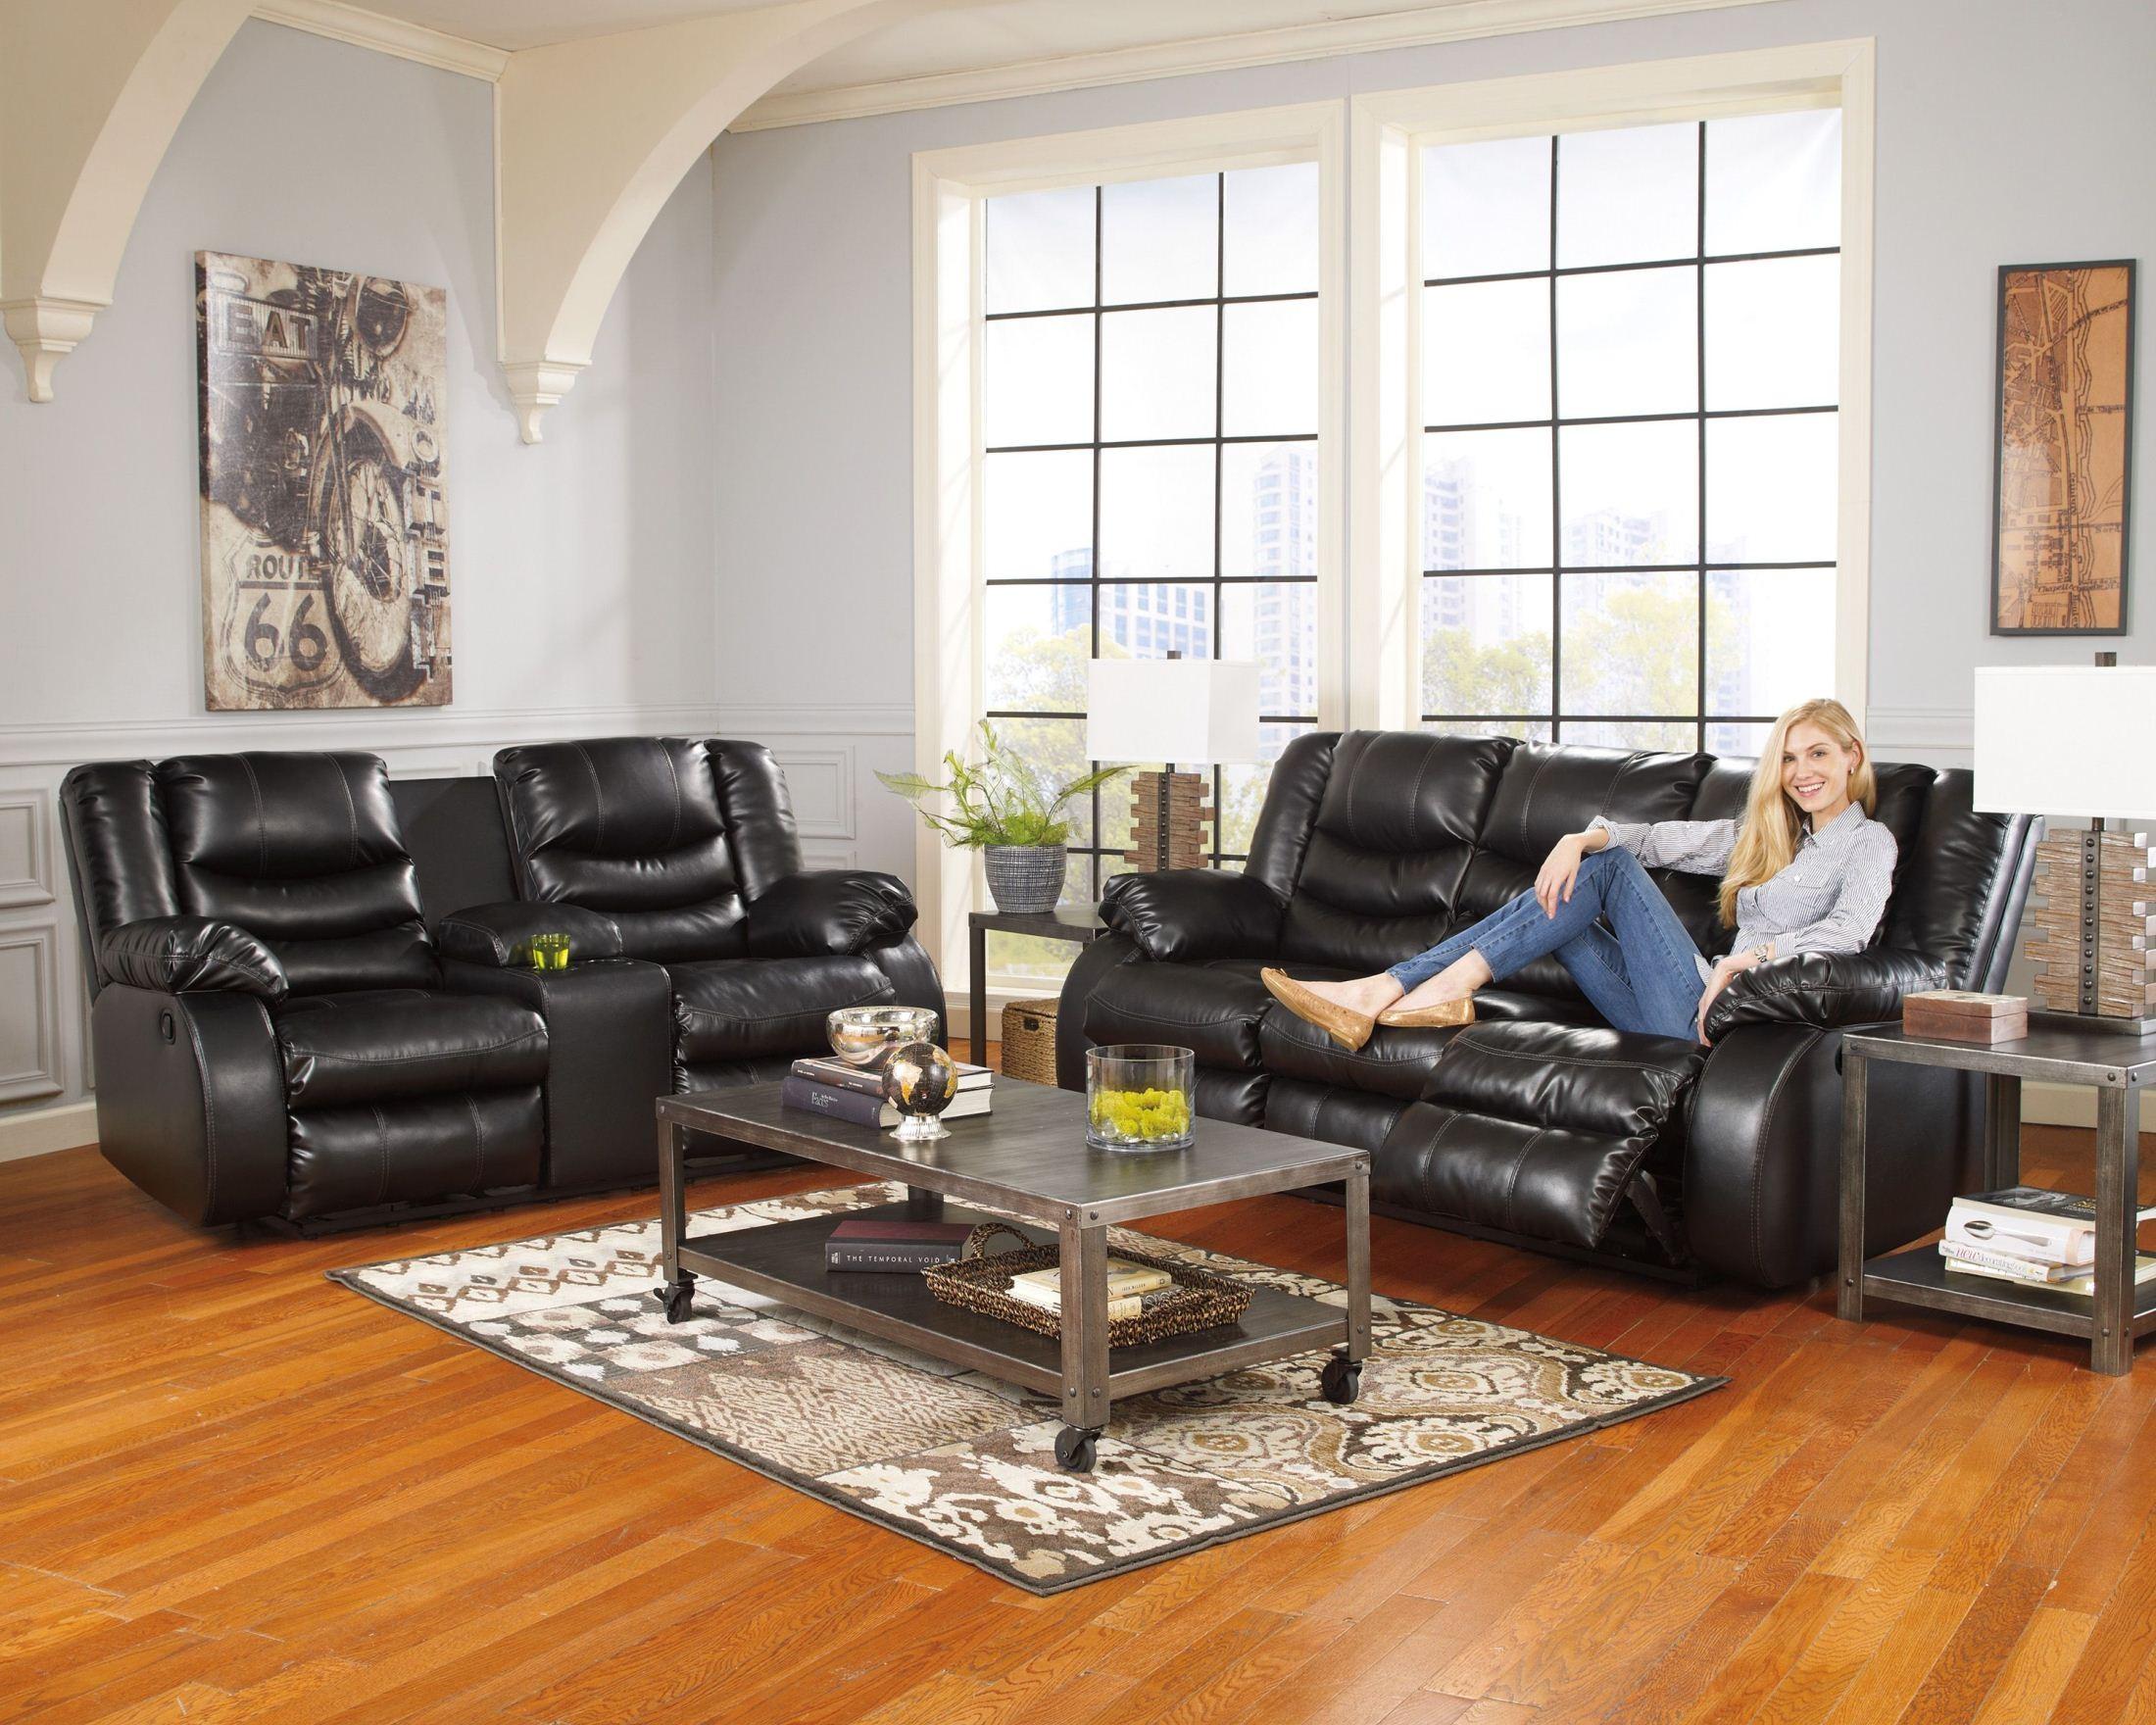 LineBacker DuraBlend Black Reclining Living Room Set from Ashley